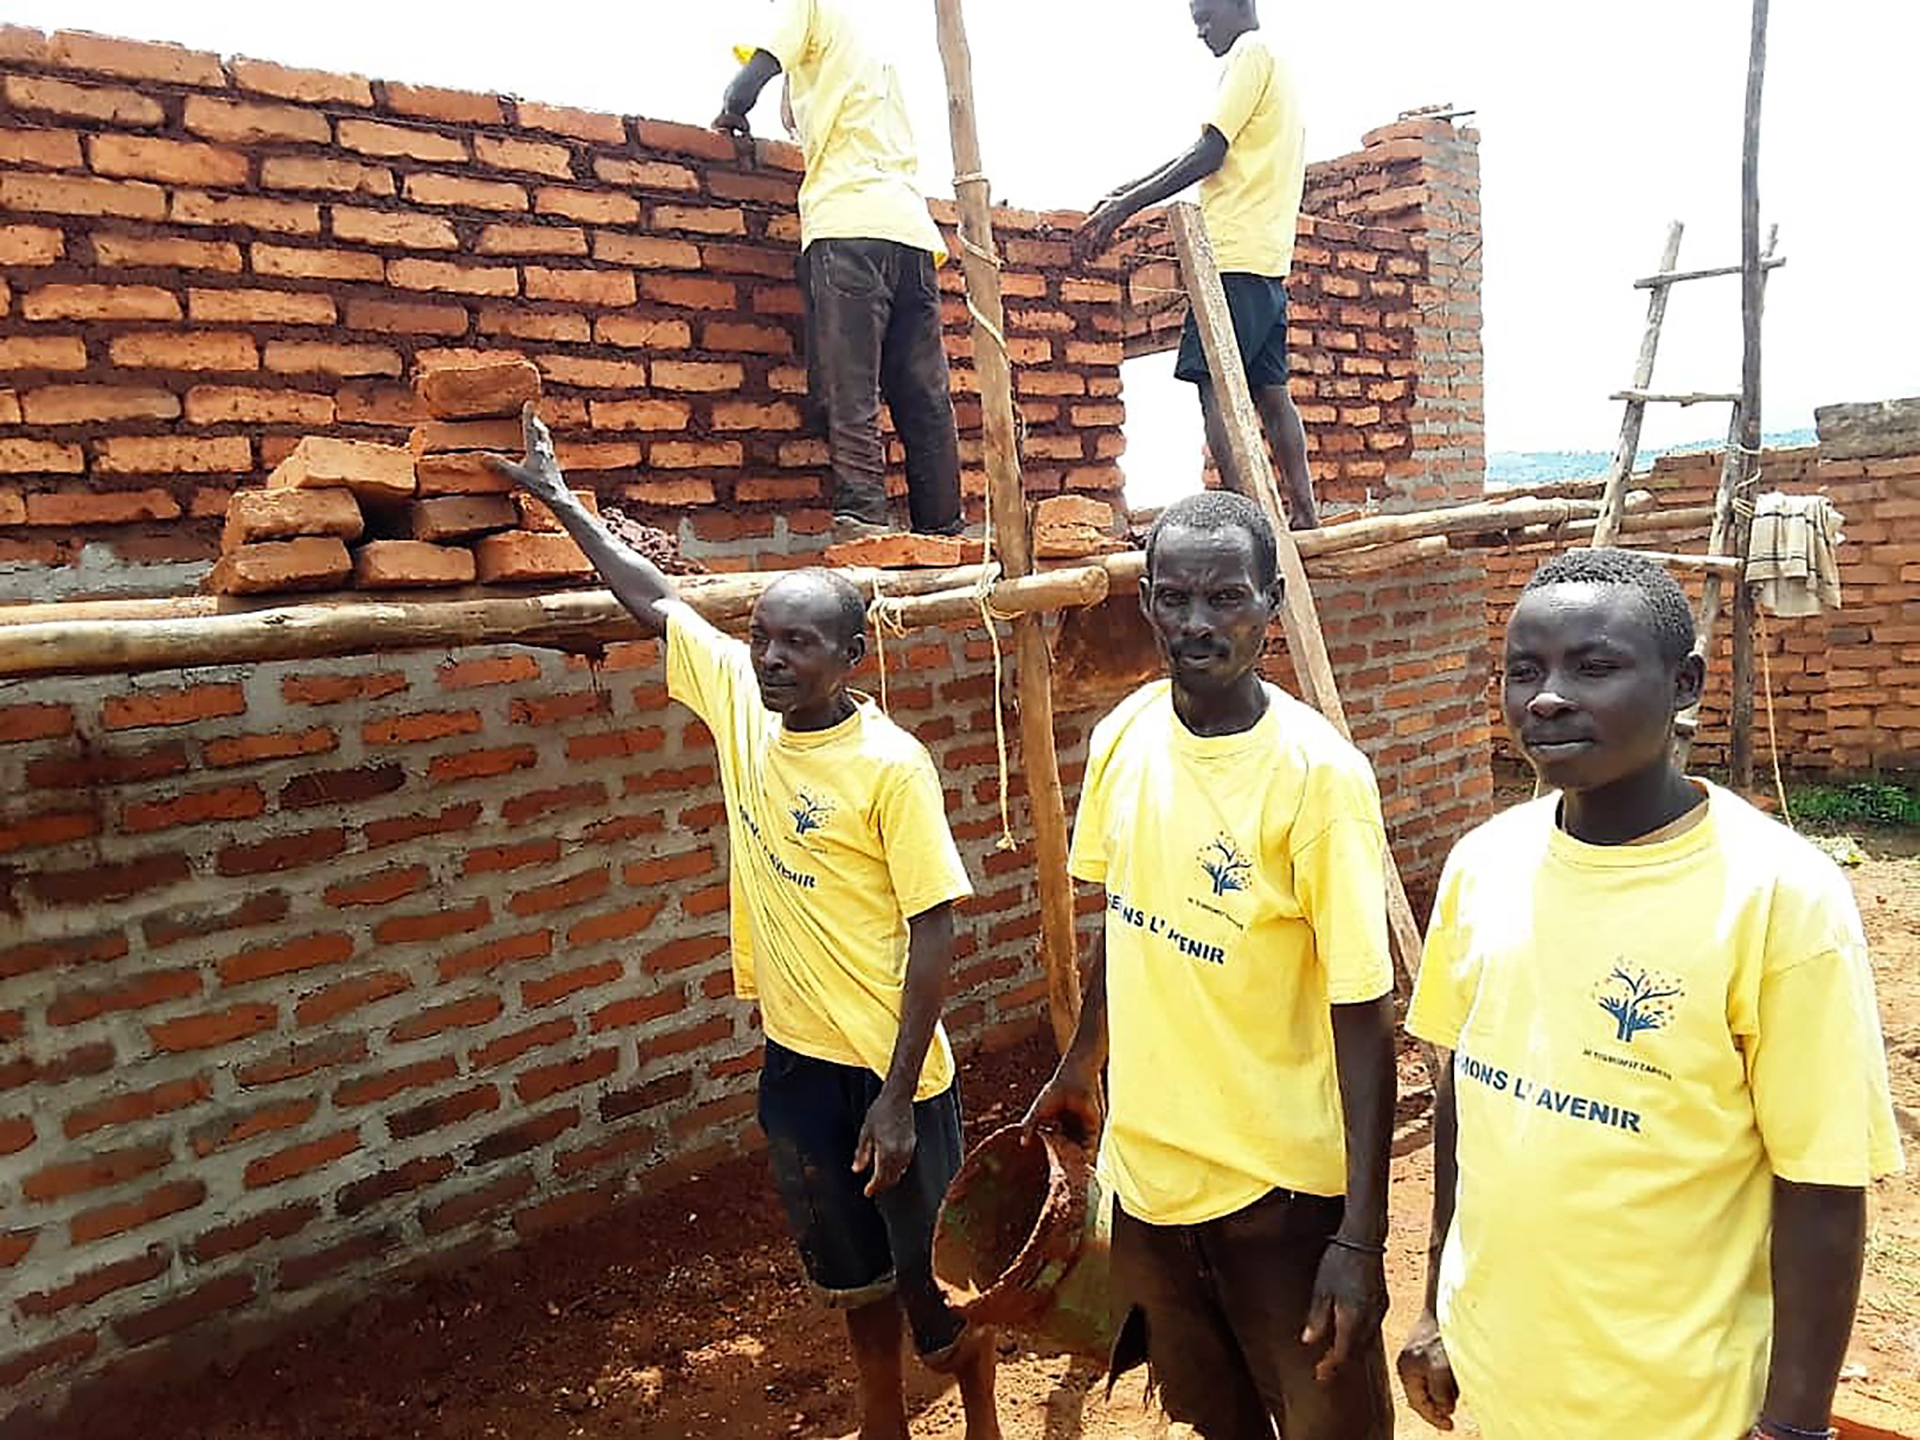 School handel- vakopleiding Burundi